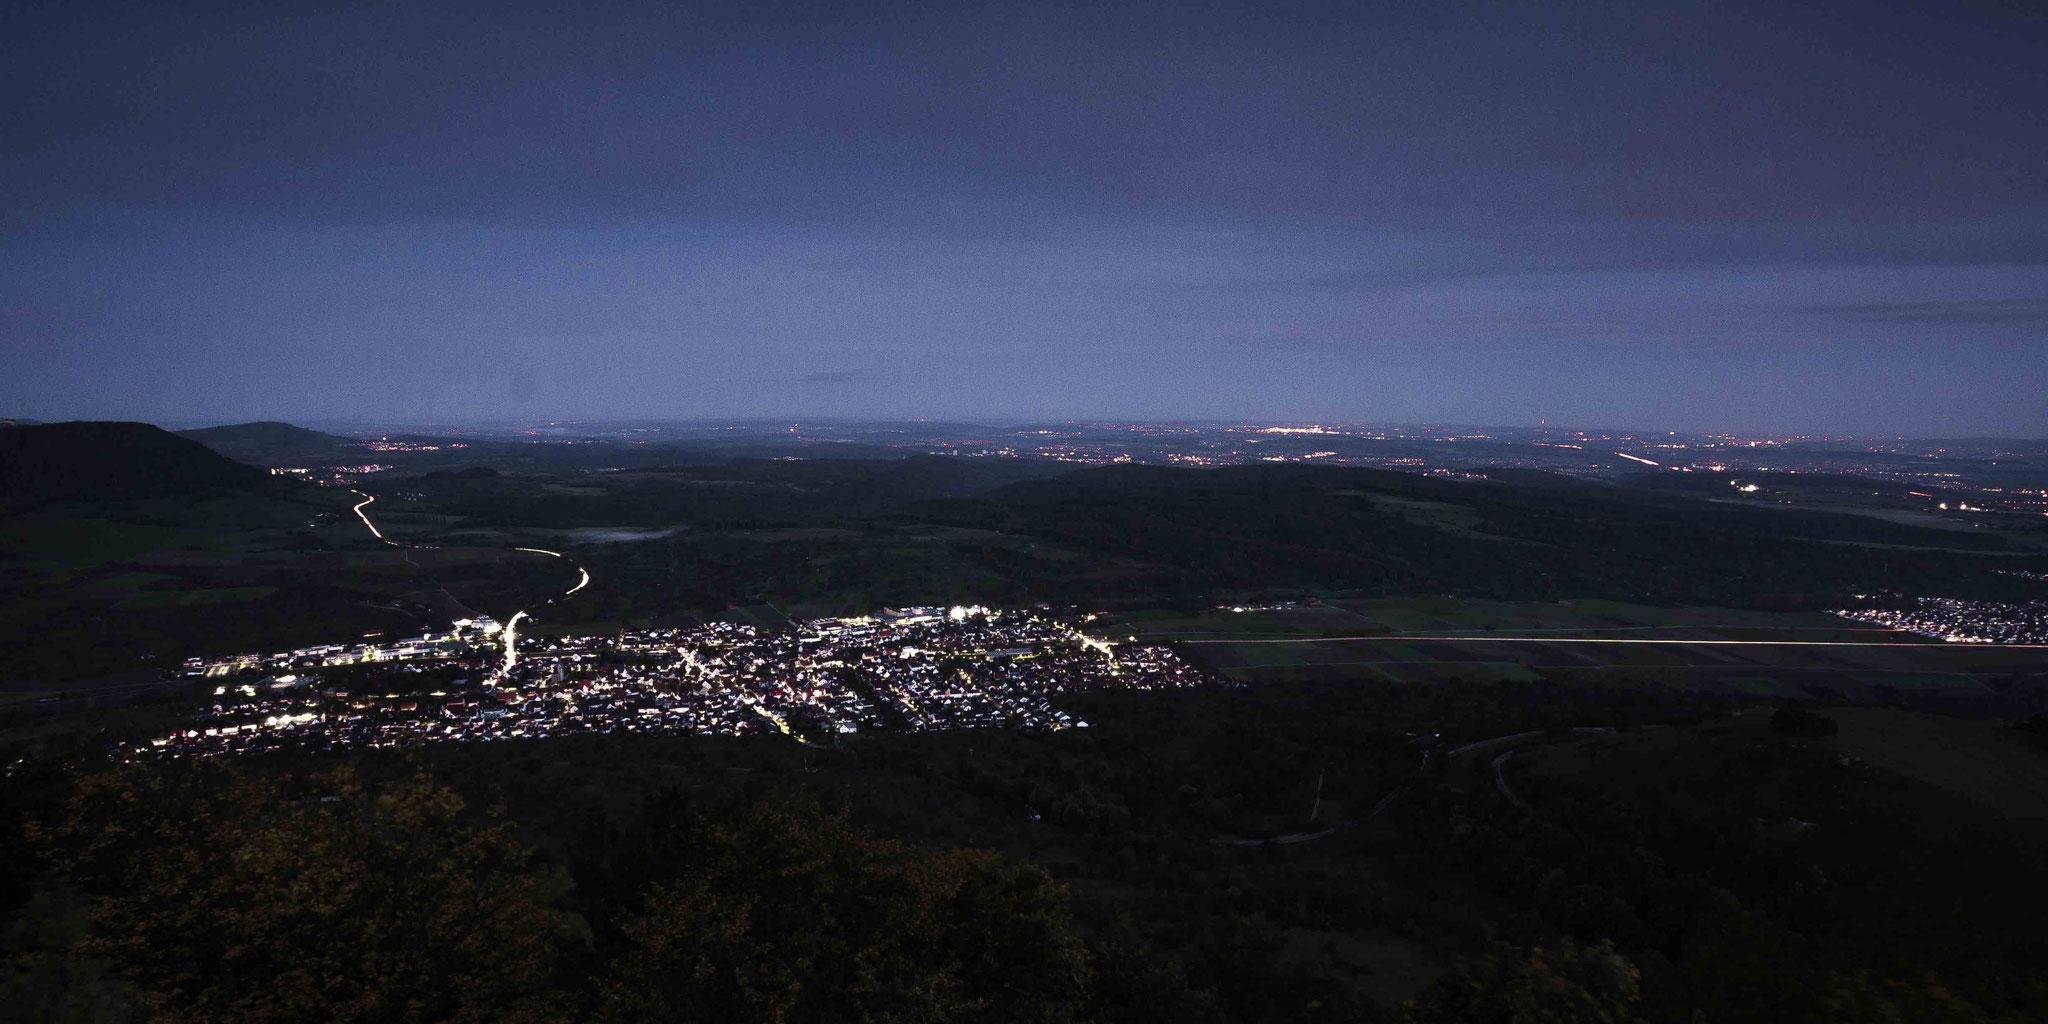 Nachtpanorama; Burg Teck